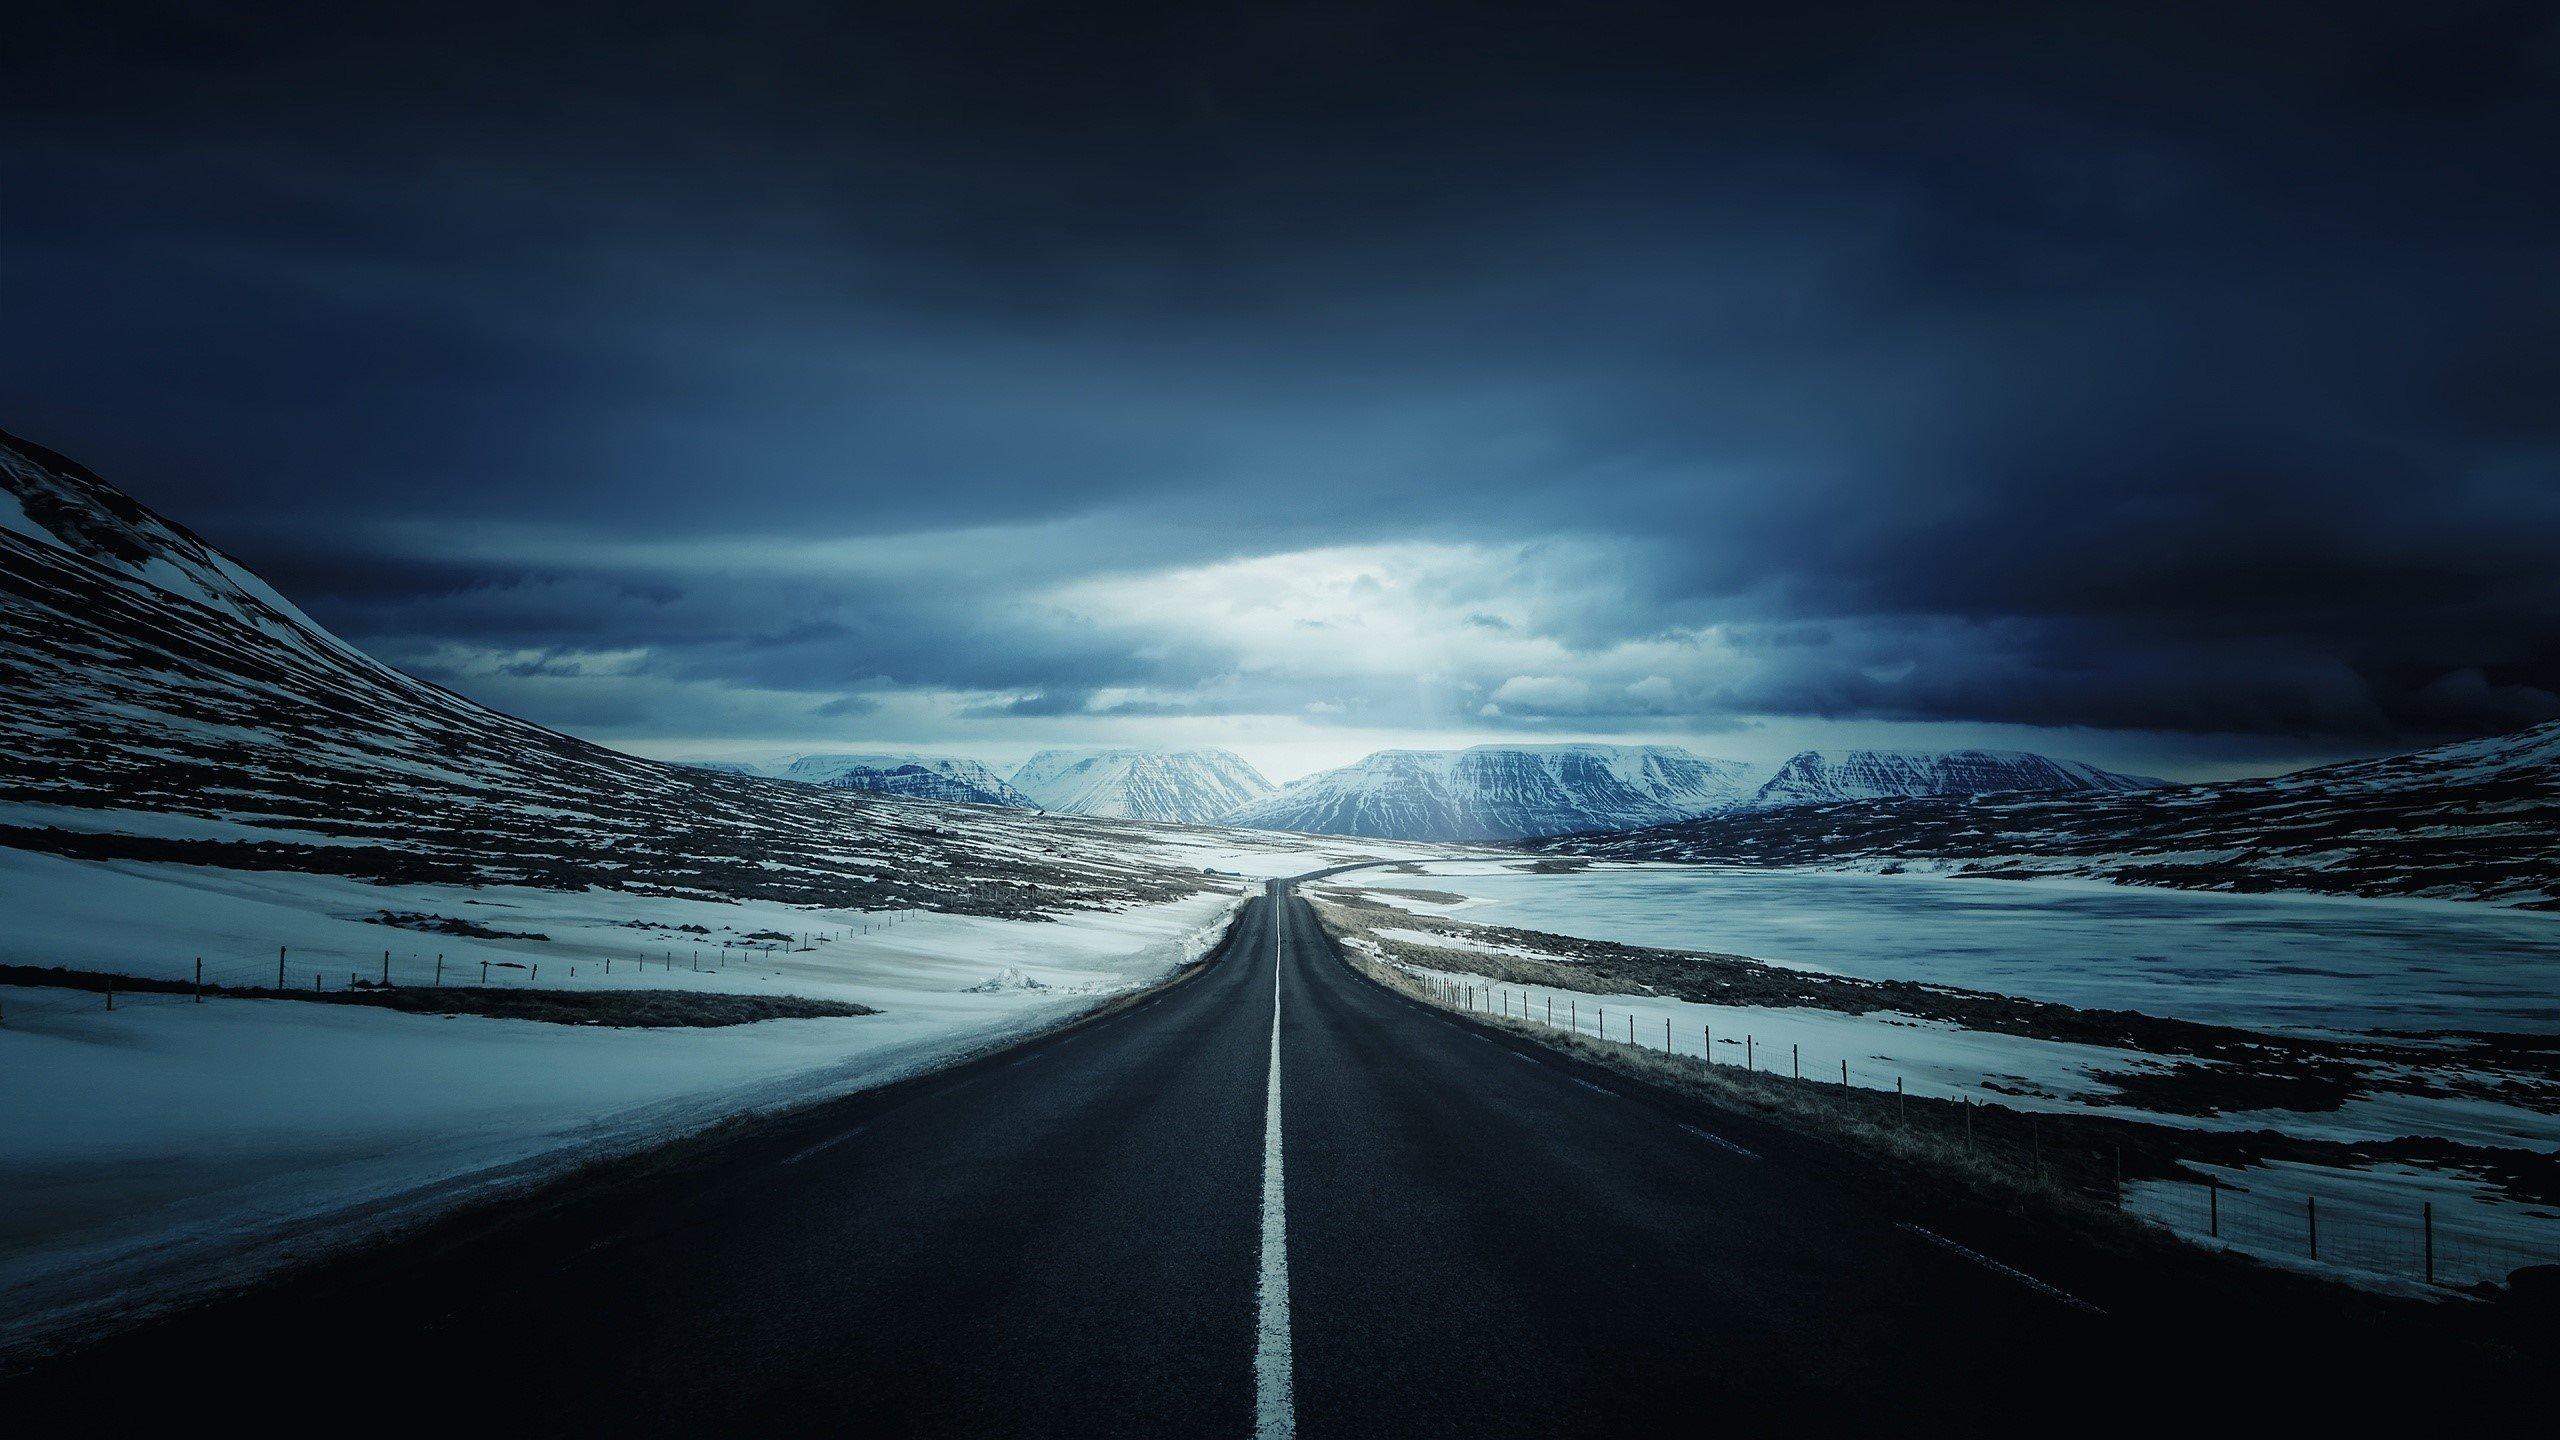 Fondos de pantalla Carretera de hielo